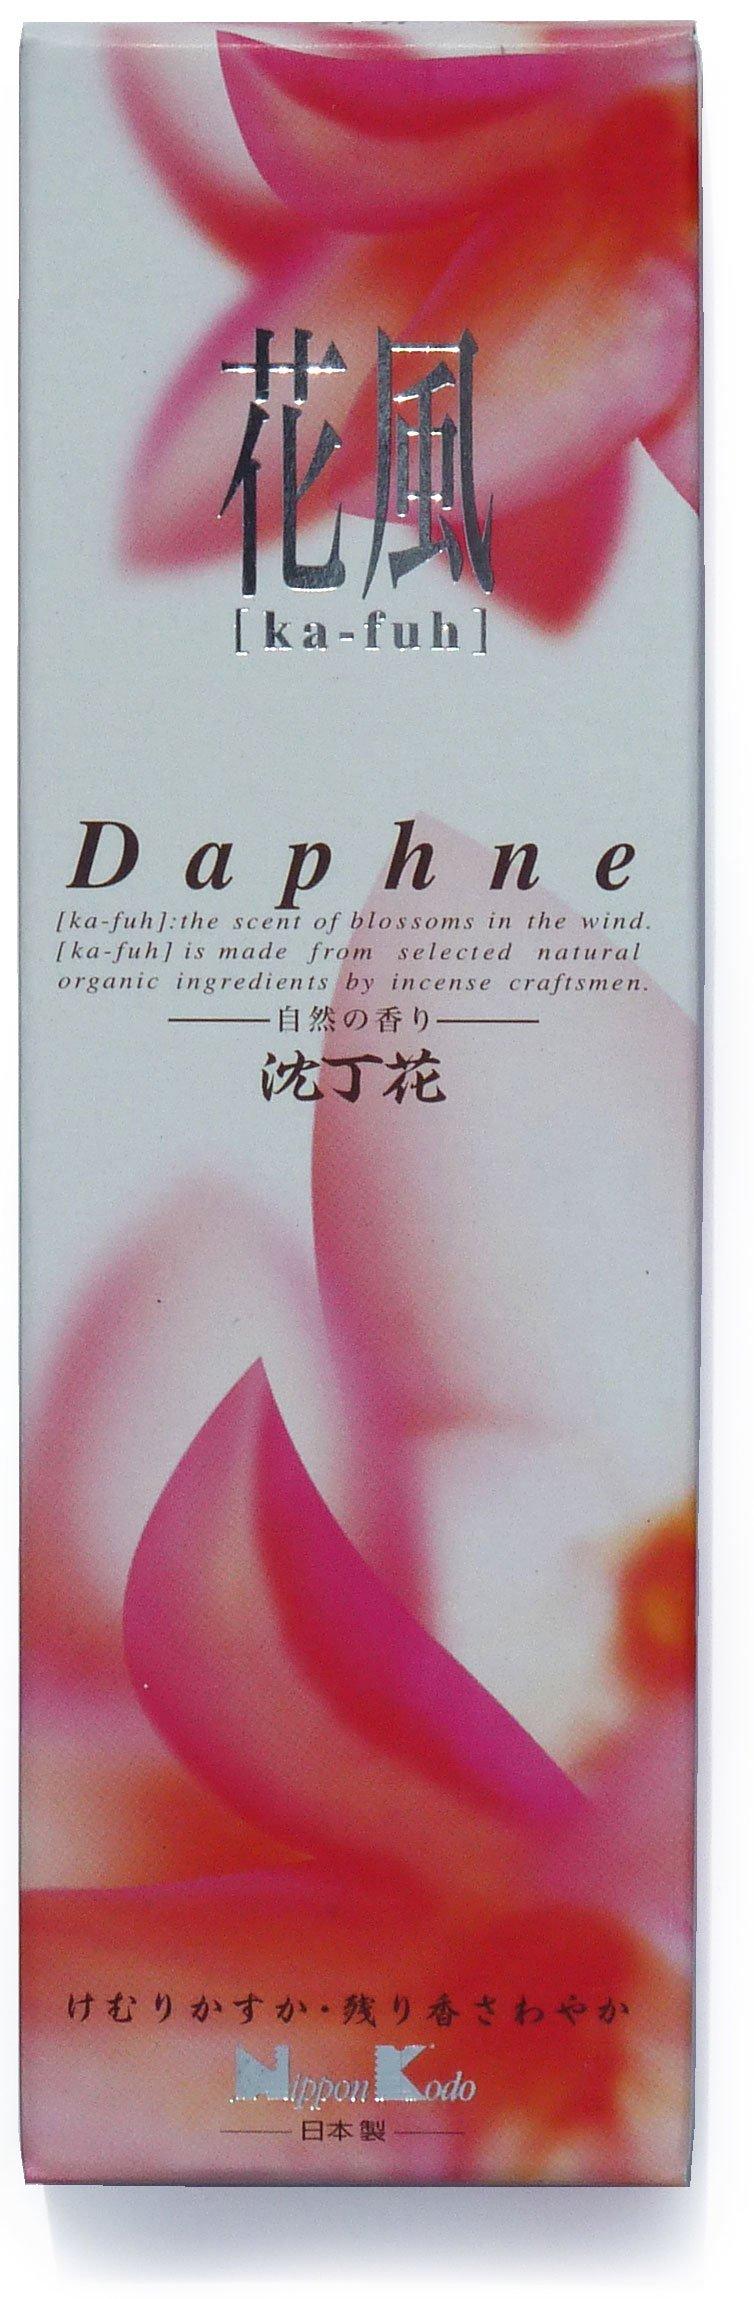 Nippon Kodo - Ka-fuh (Scents in the Wind) - Daphne 120 Sticks